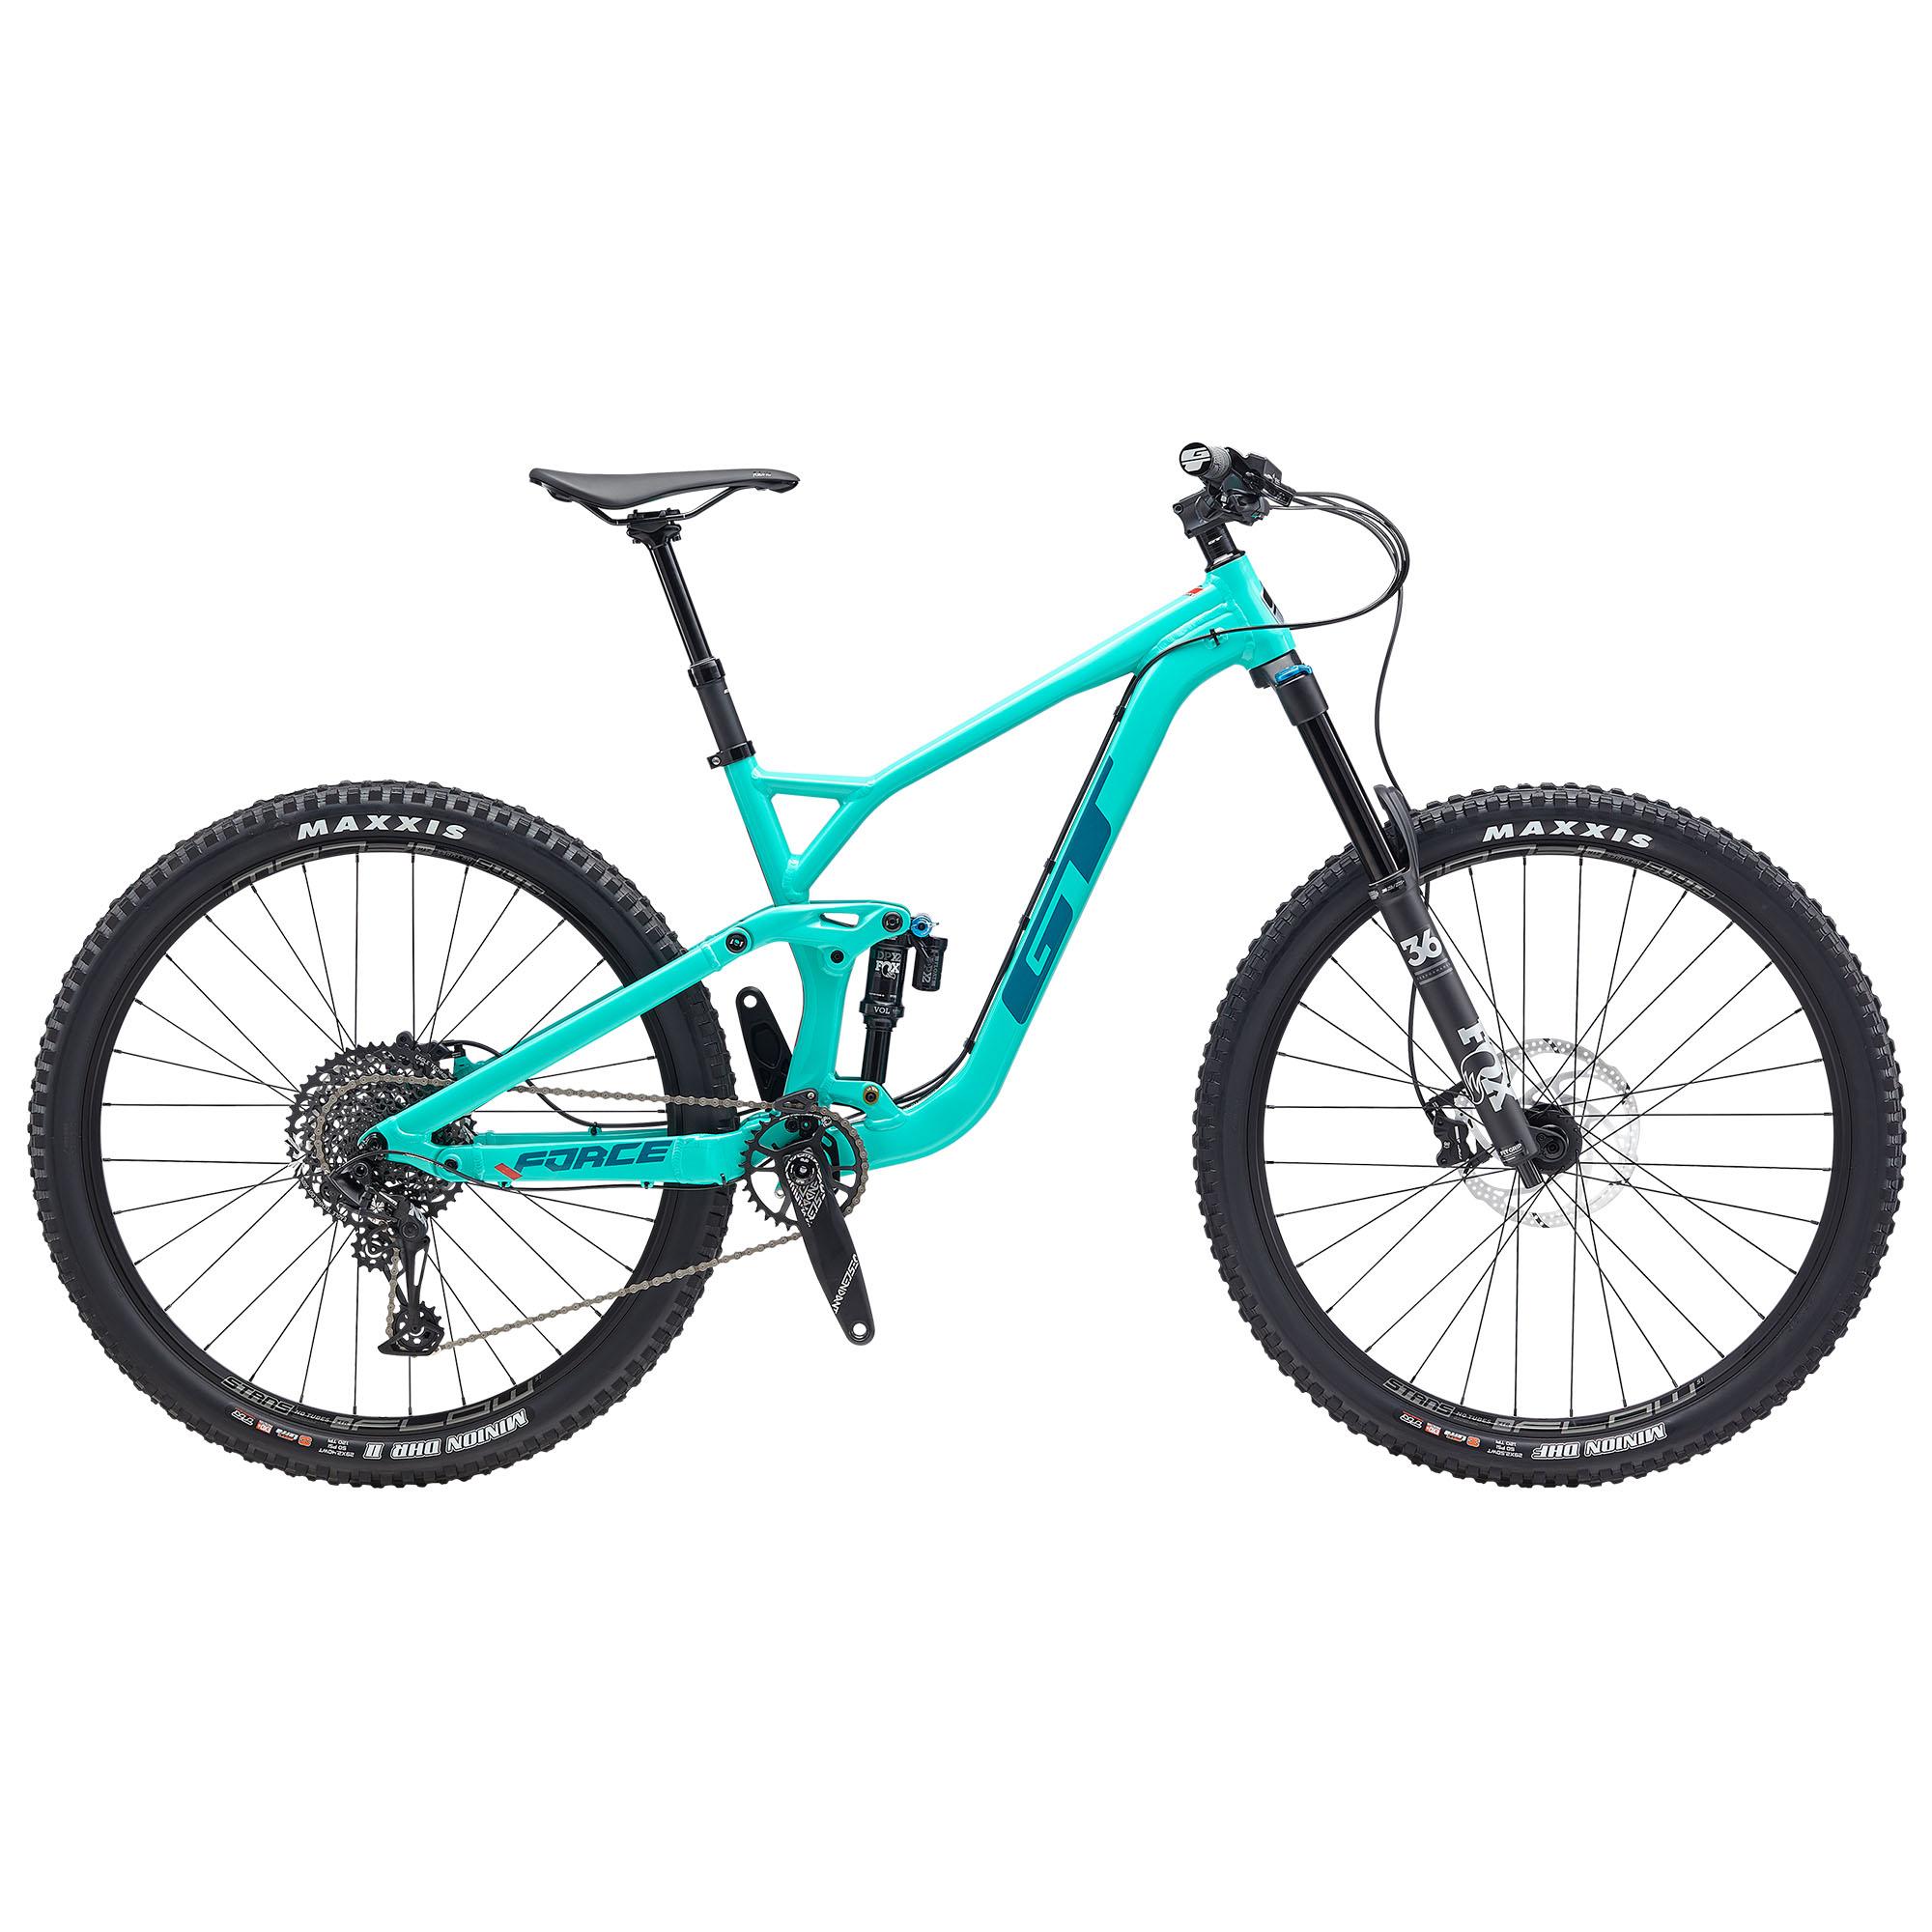 GT Bicycles Men's Force 29 Expert Mountain Bike '20 -  00038675179639